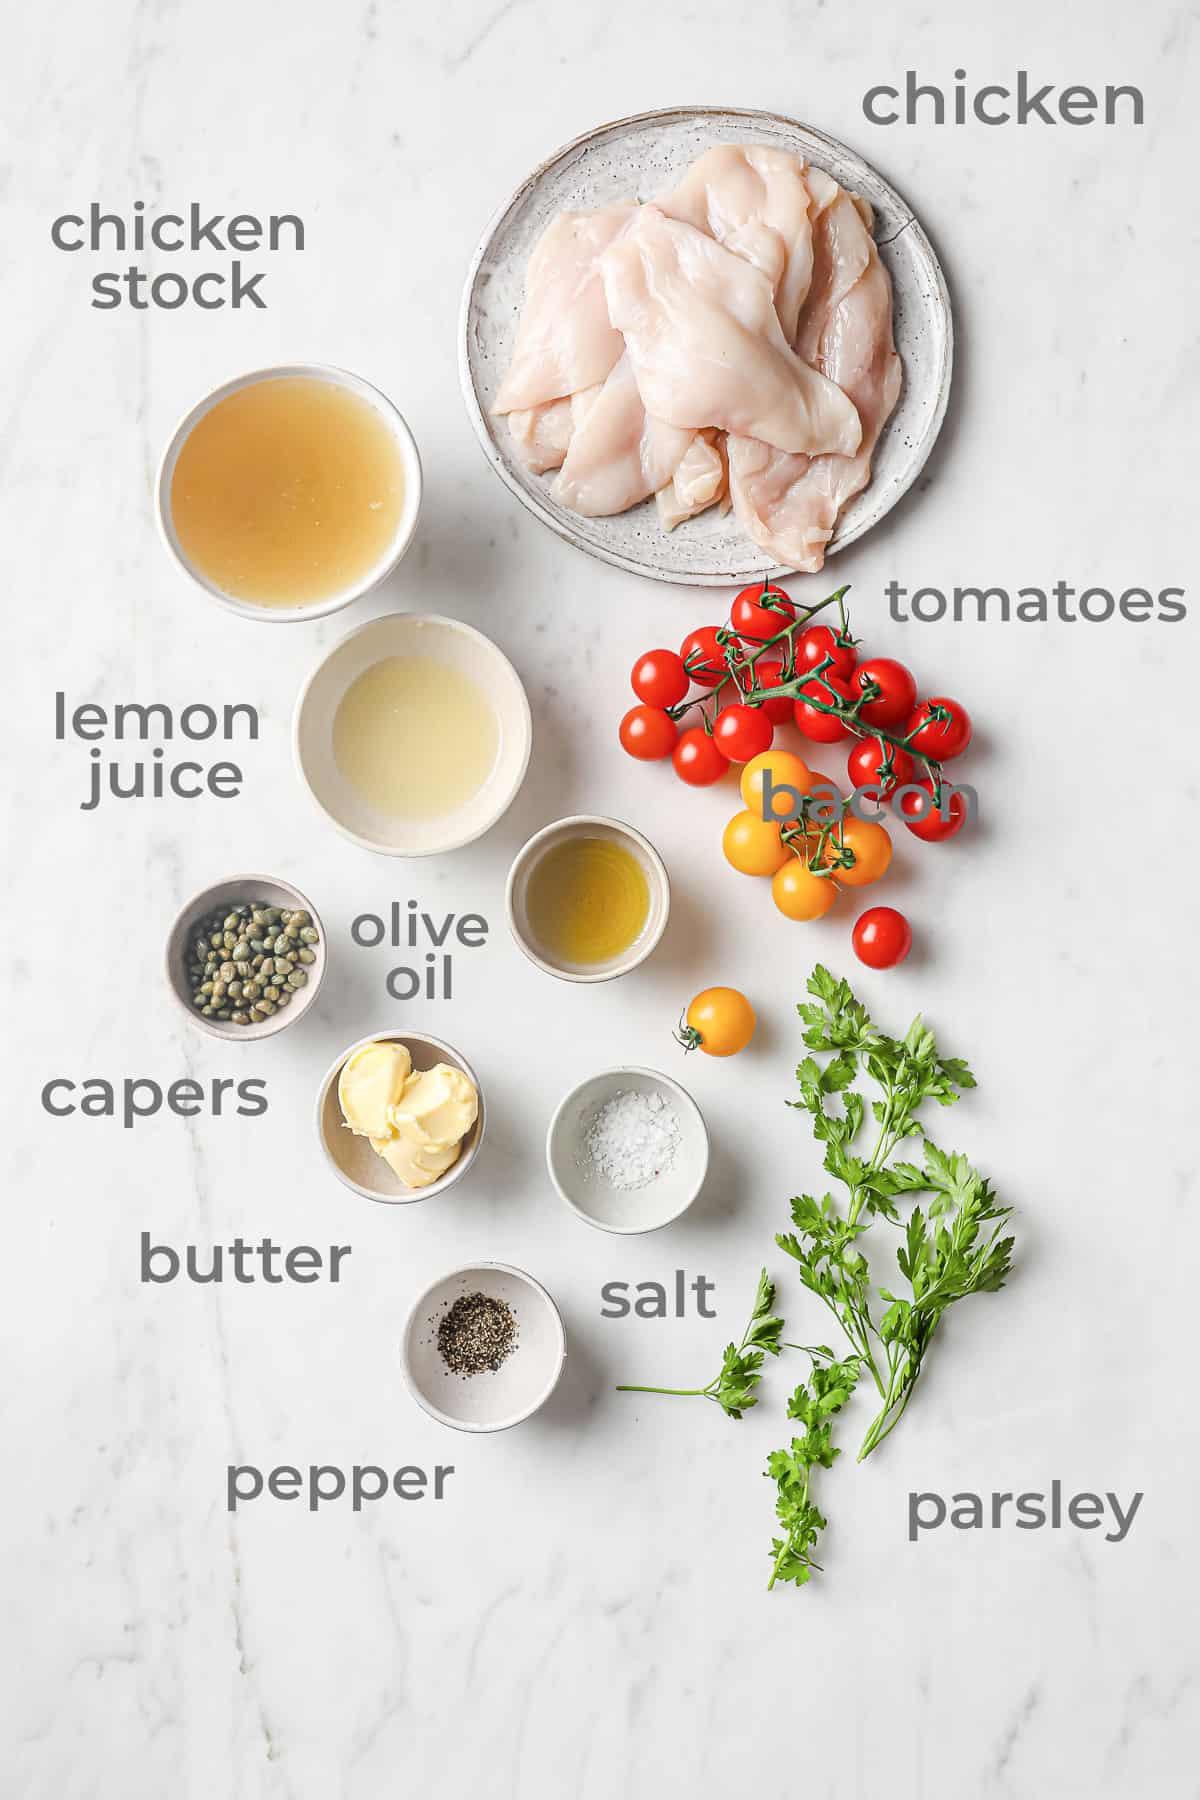 Ingredients for Keto Chicken Scallopini - chicken capers, lemon juice, tomatoes, parsley, salt, pepper, chicken stock